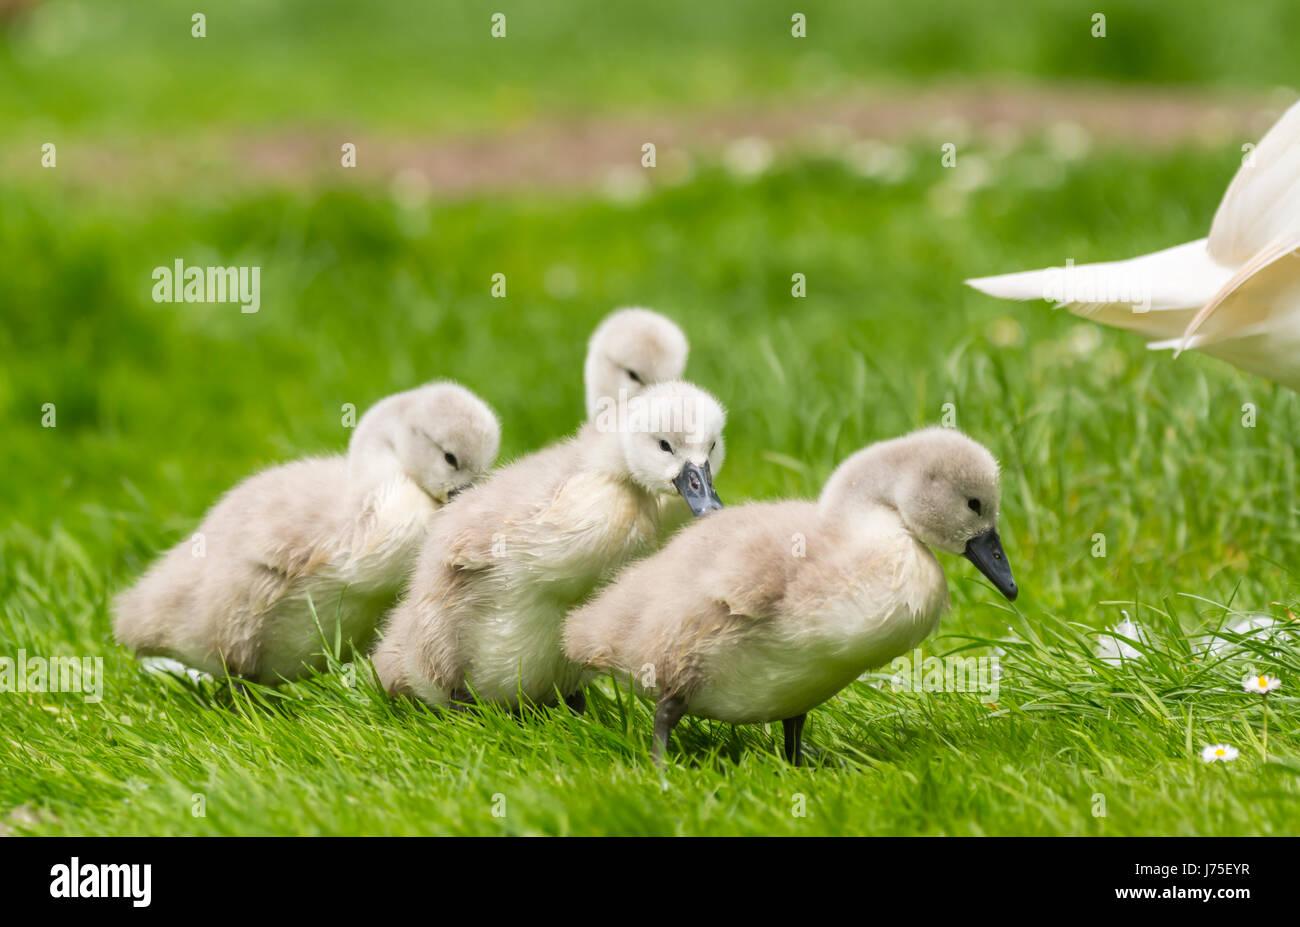 cygnets-white-mute-swan-cygnus-olorcygne